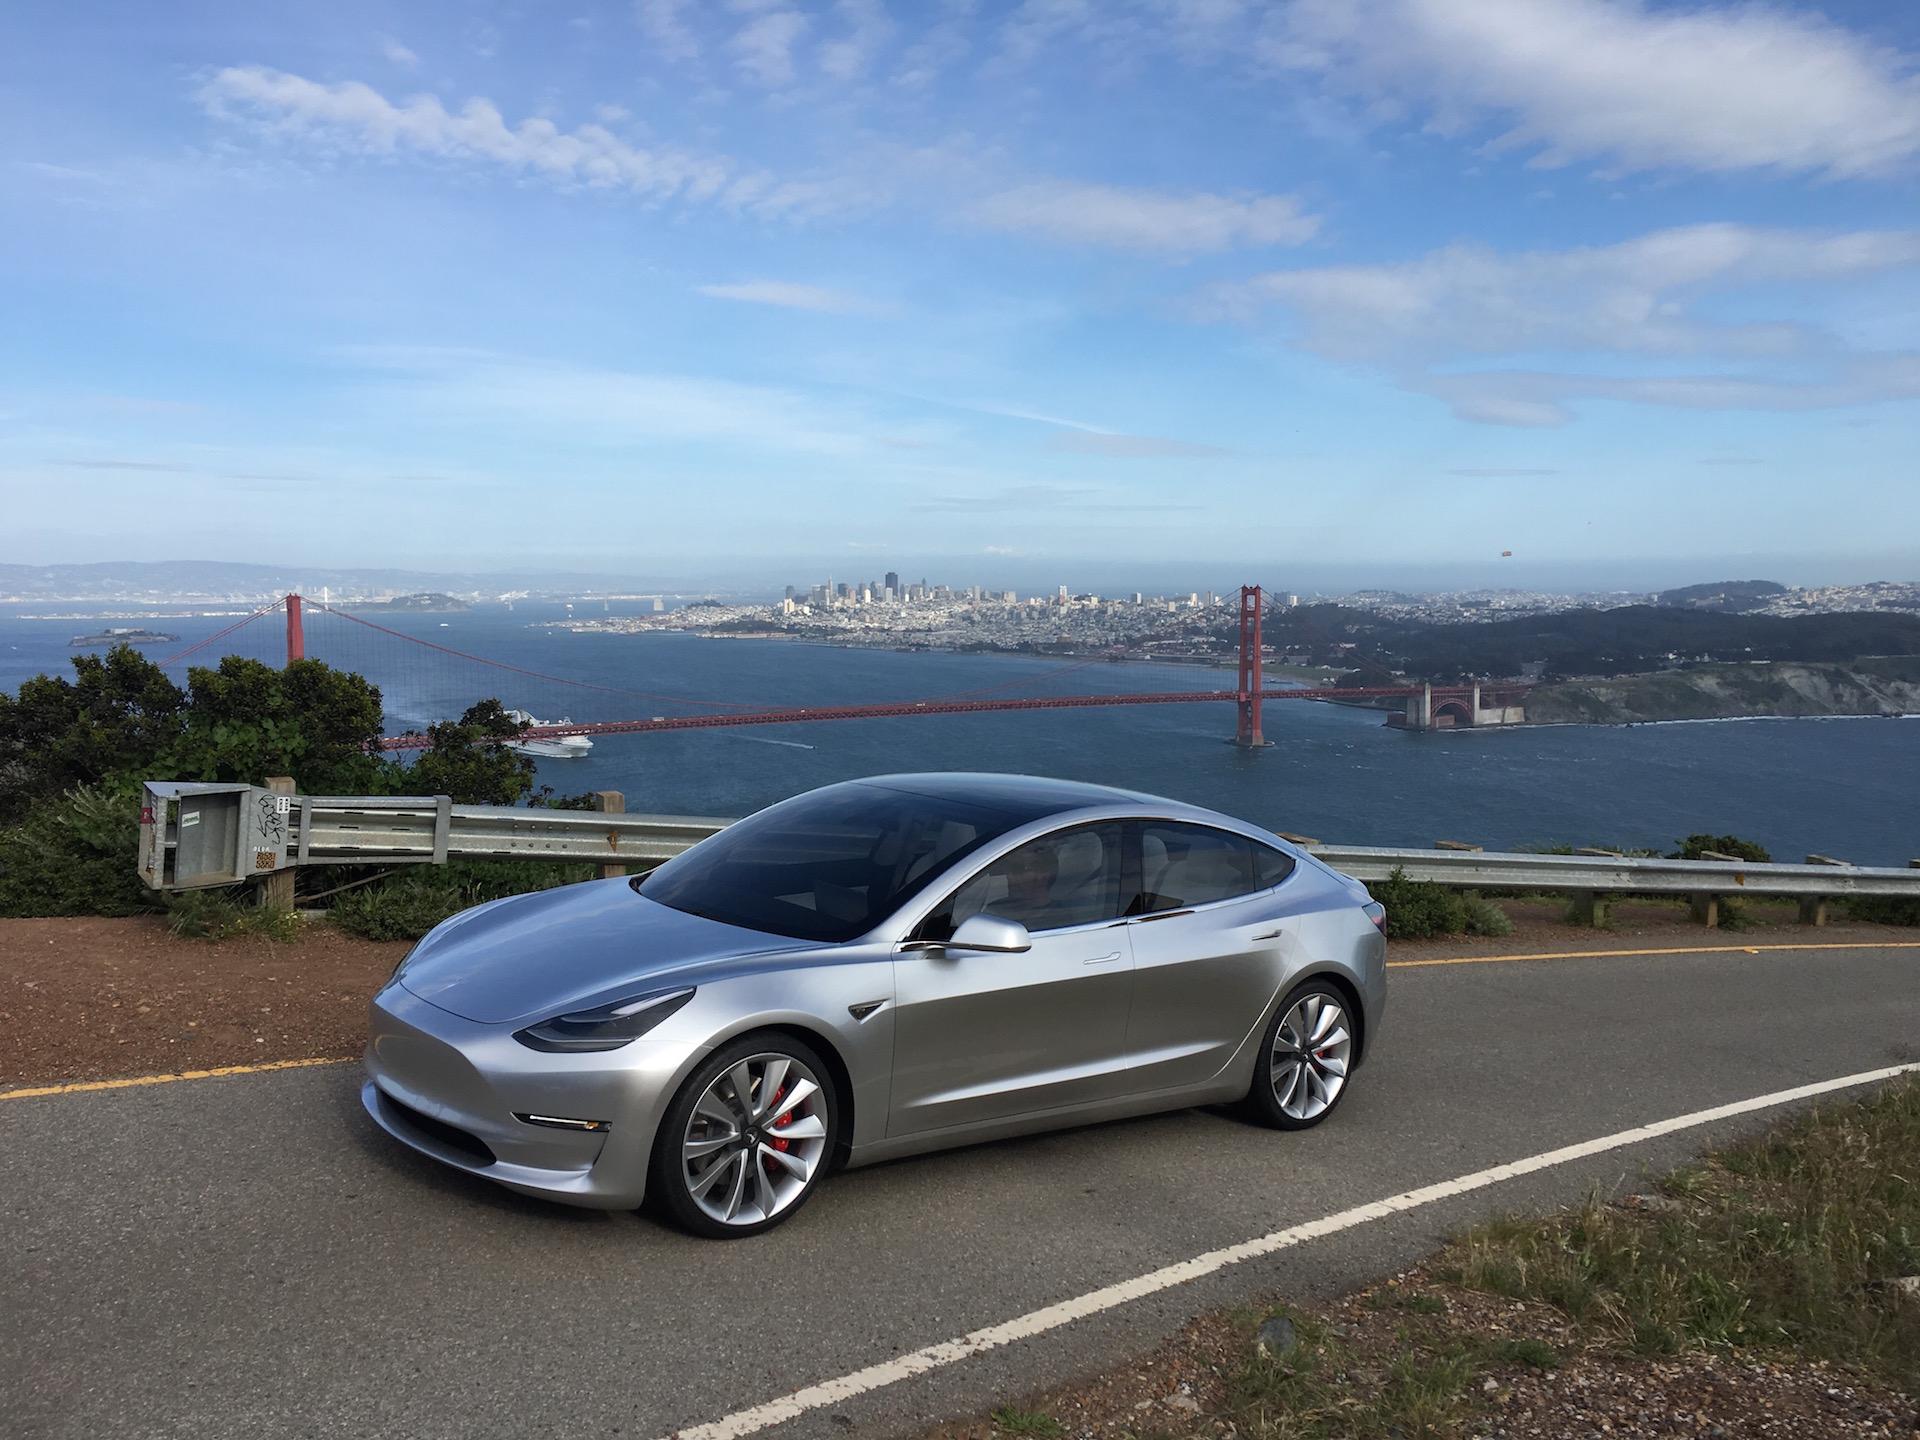 Silver Tesla Model 3 overlooking San Francisco